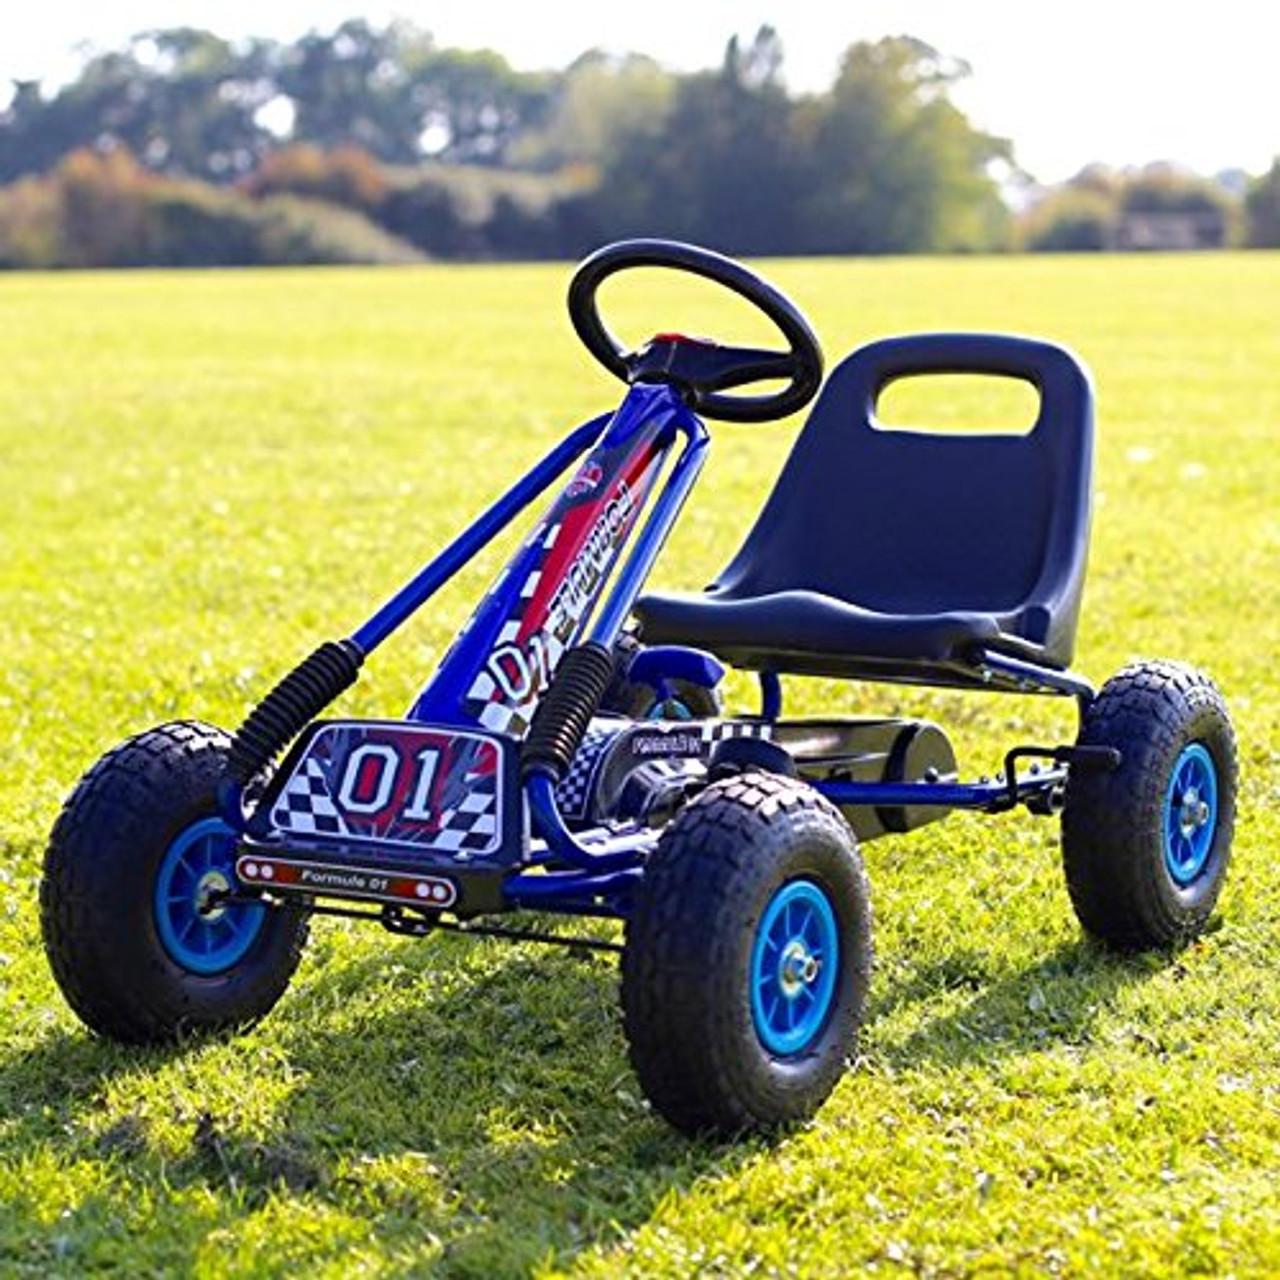 Zoom Rubber Wheel Go Kart Cart Blue Black 3 7 Years